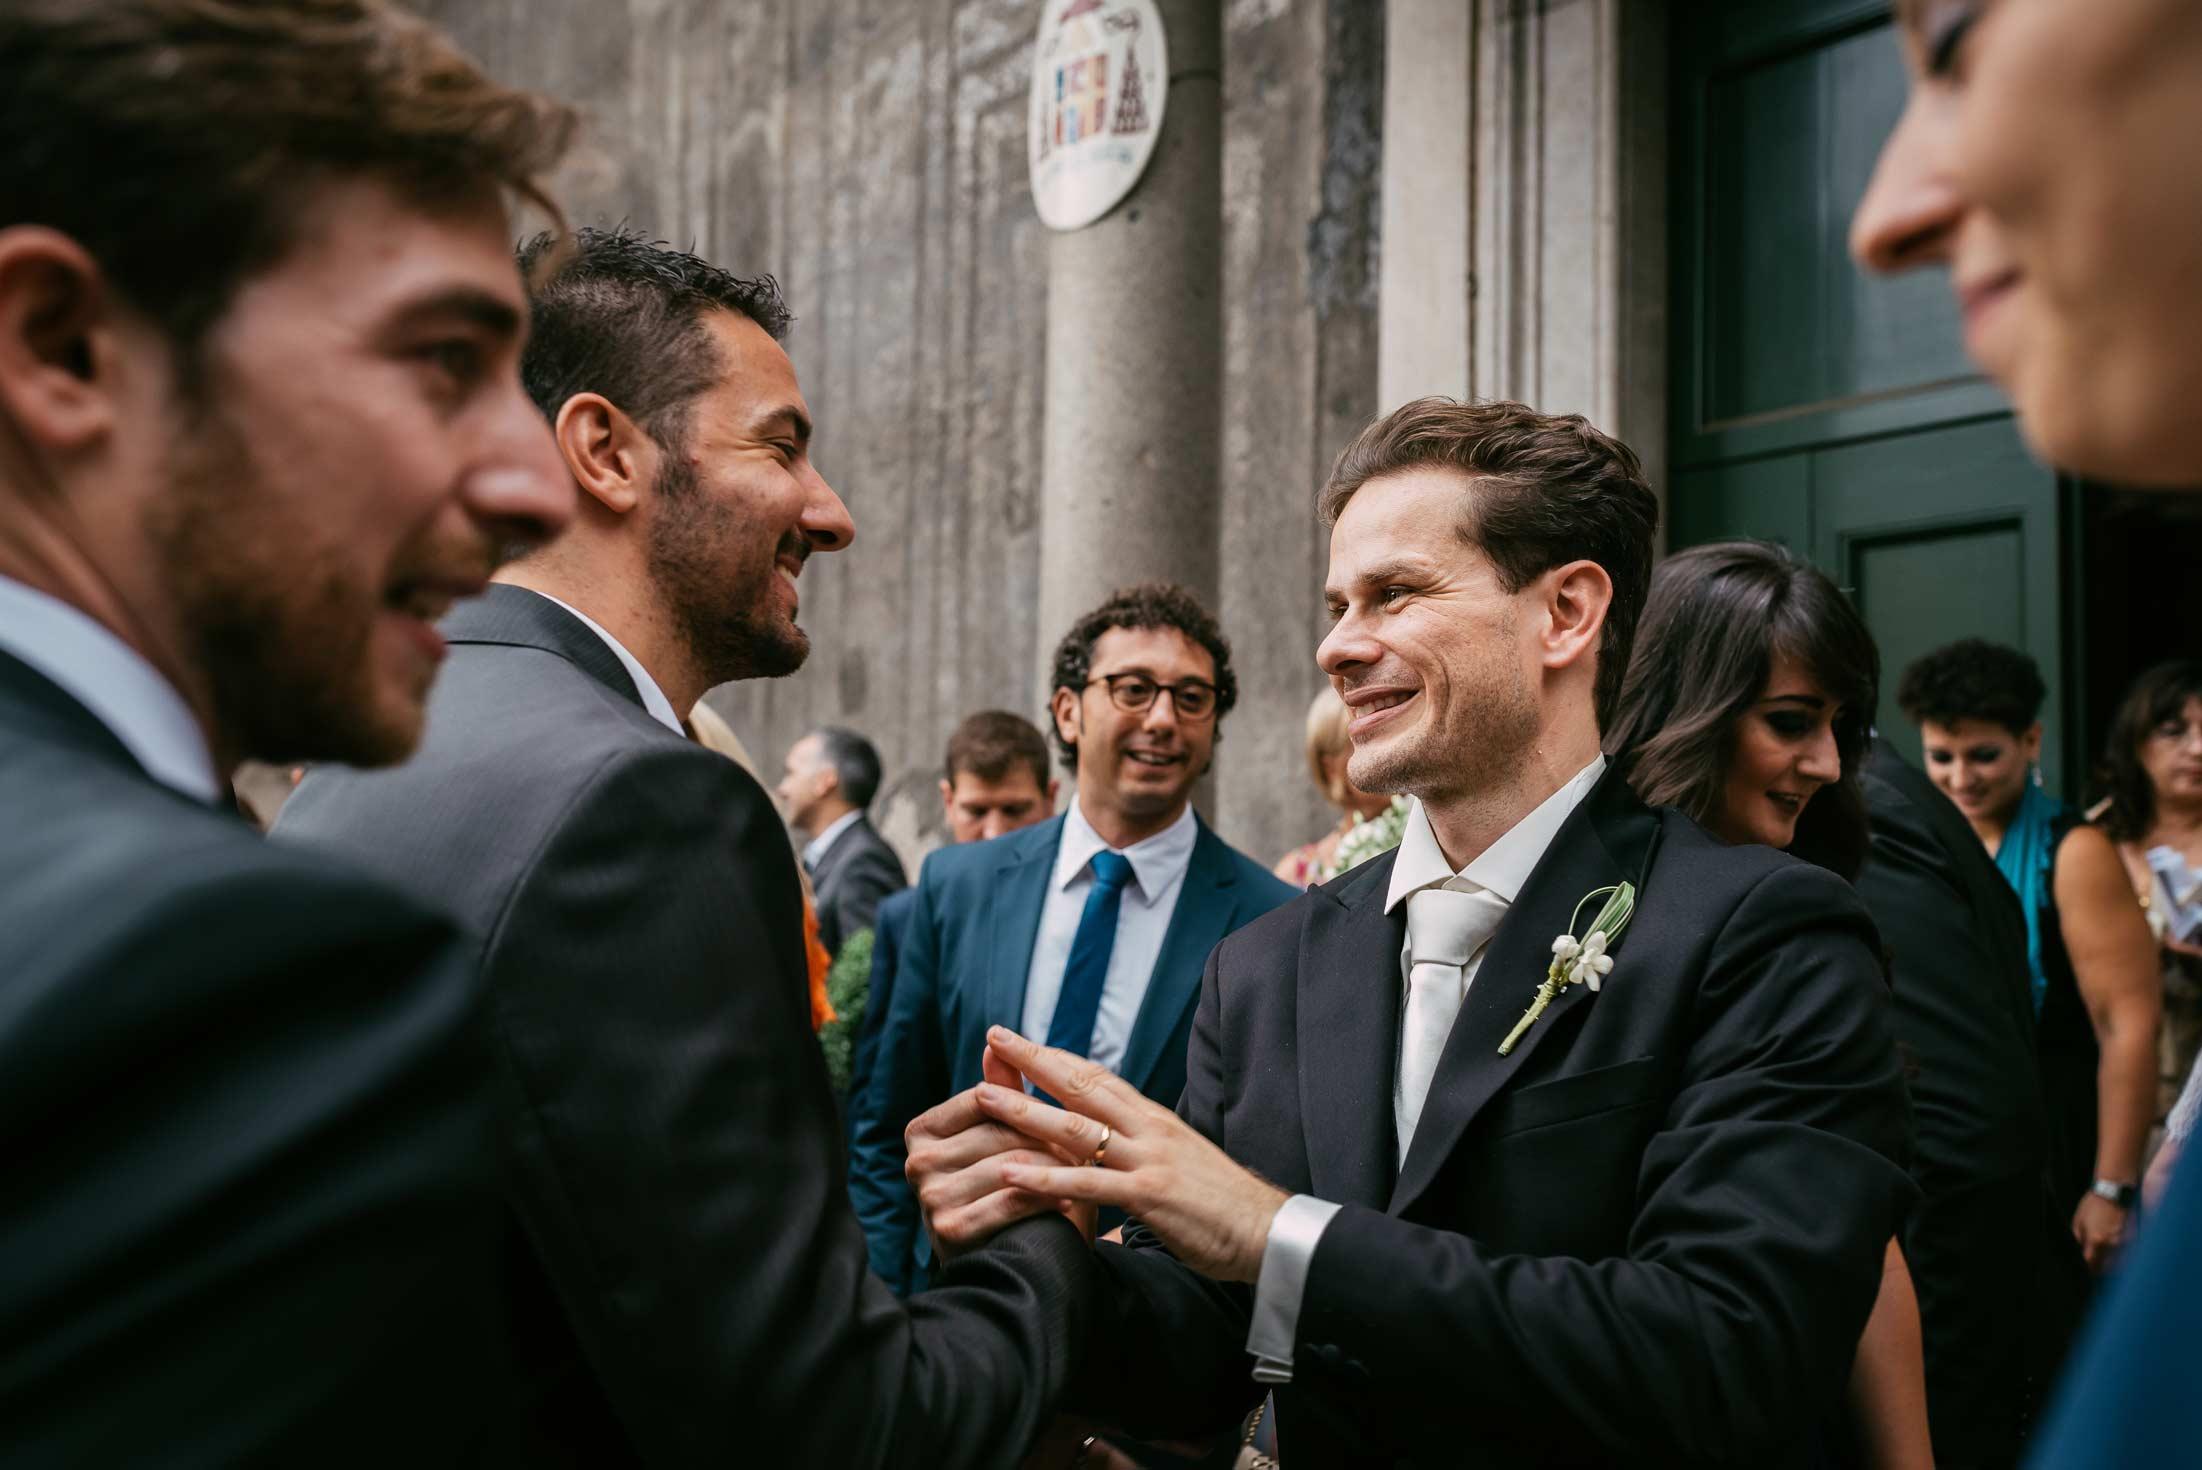 Fotografo-Matrimonio-Reportage-Roma-Cerimonia